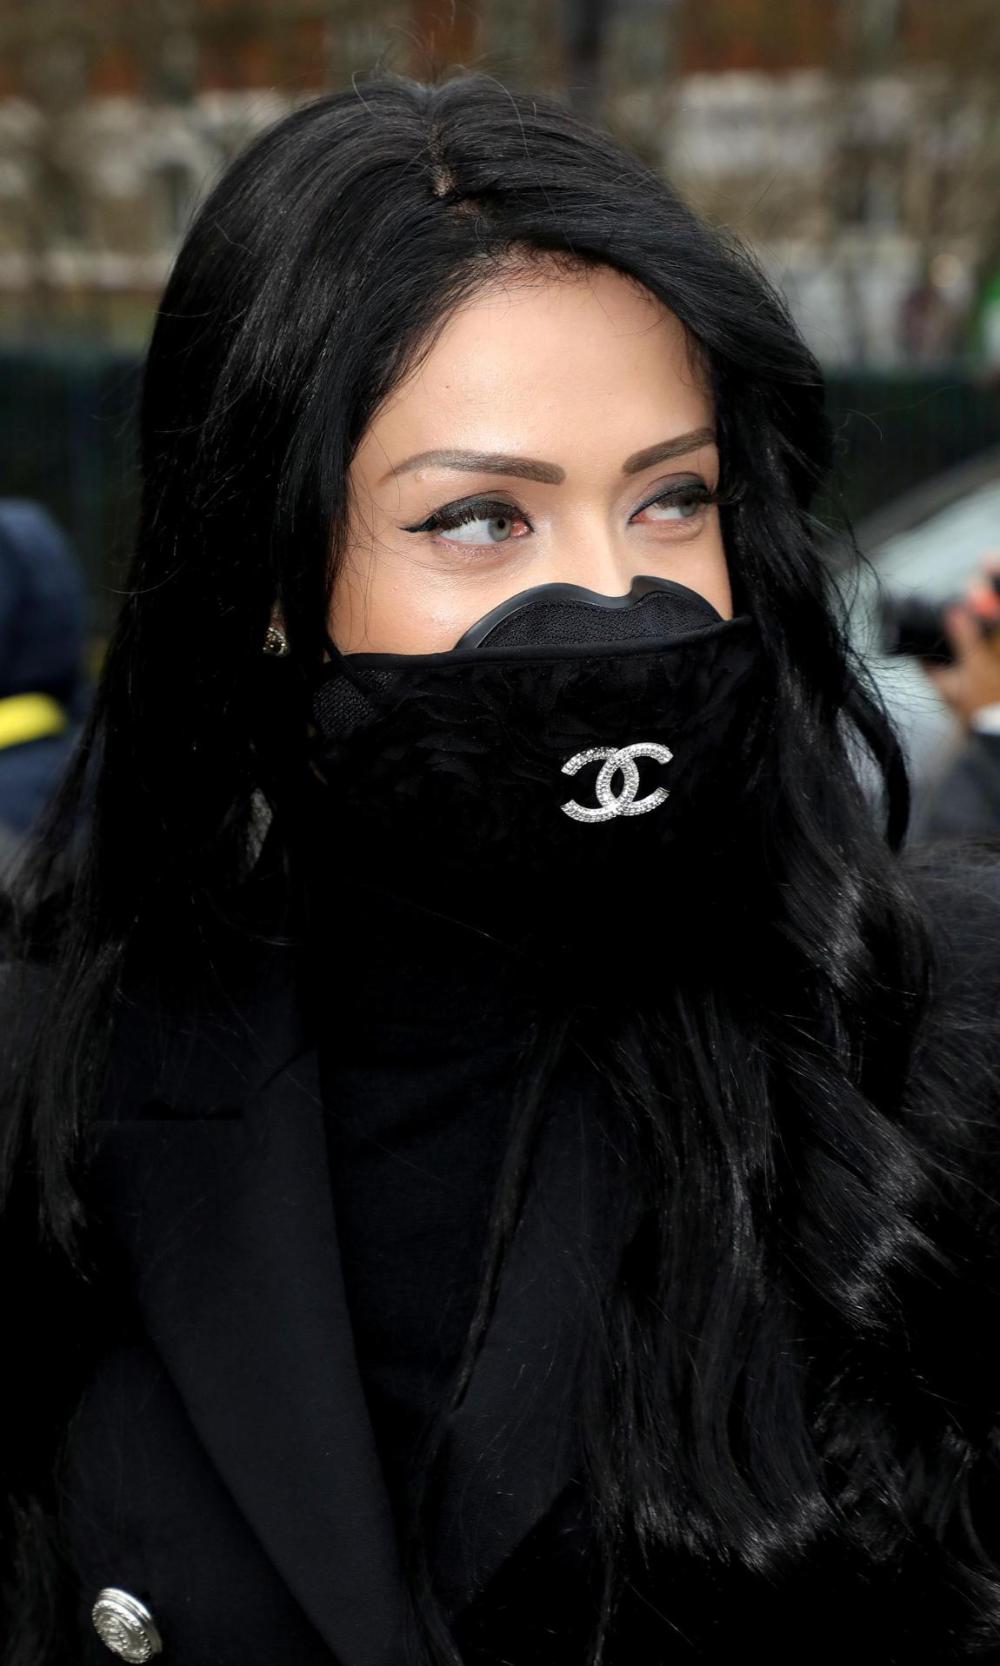 chanel 10 arrival   Fashion face mask, Mouth mask fashion ...